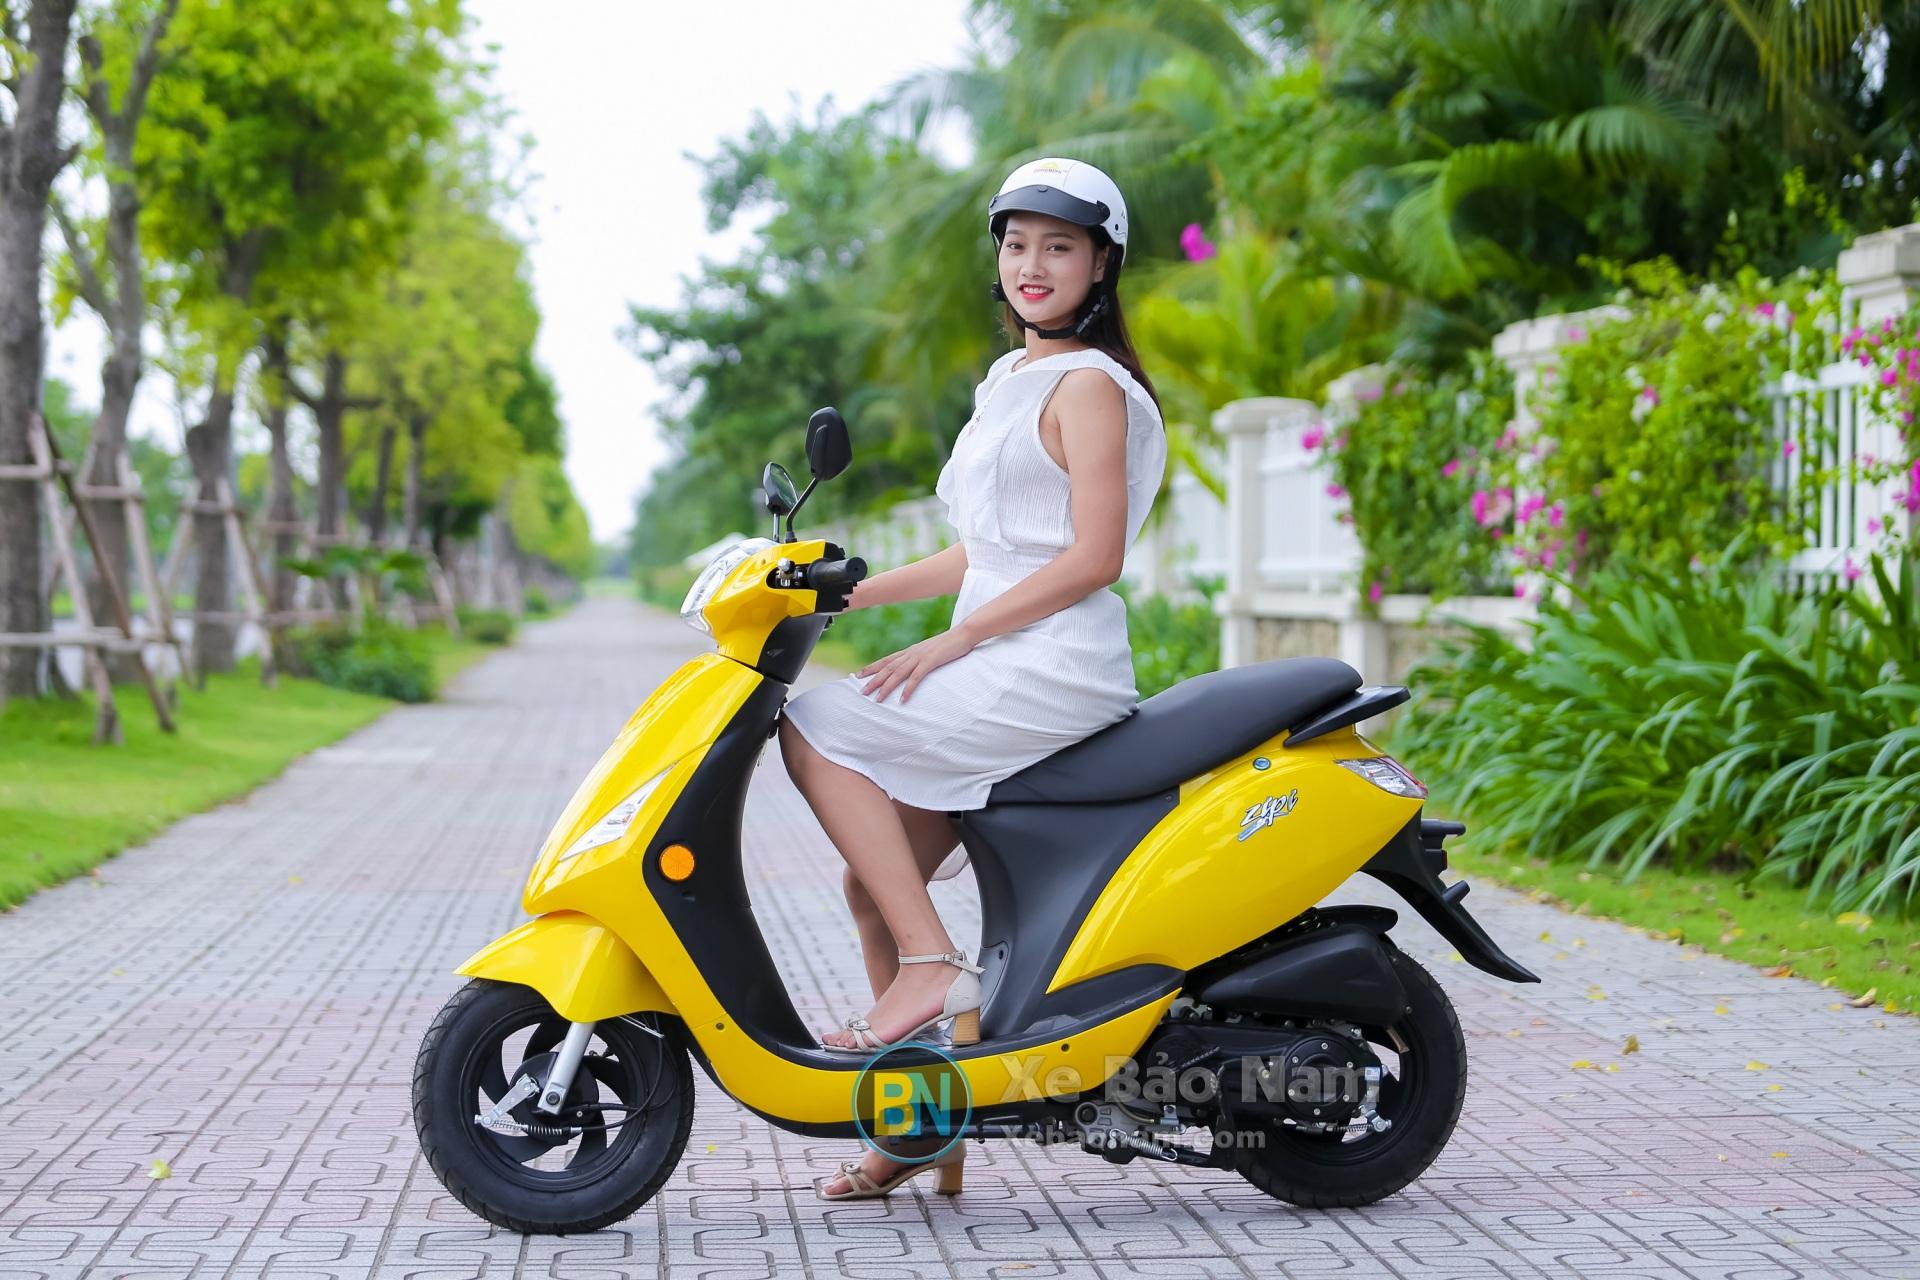 xe-ga-50cc-zip-khong-can-bang-lai-4